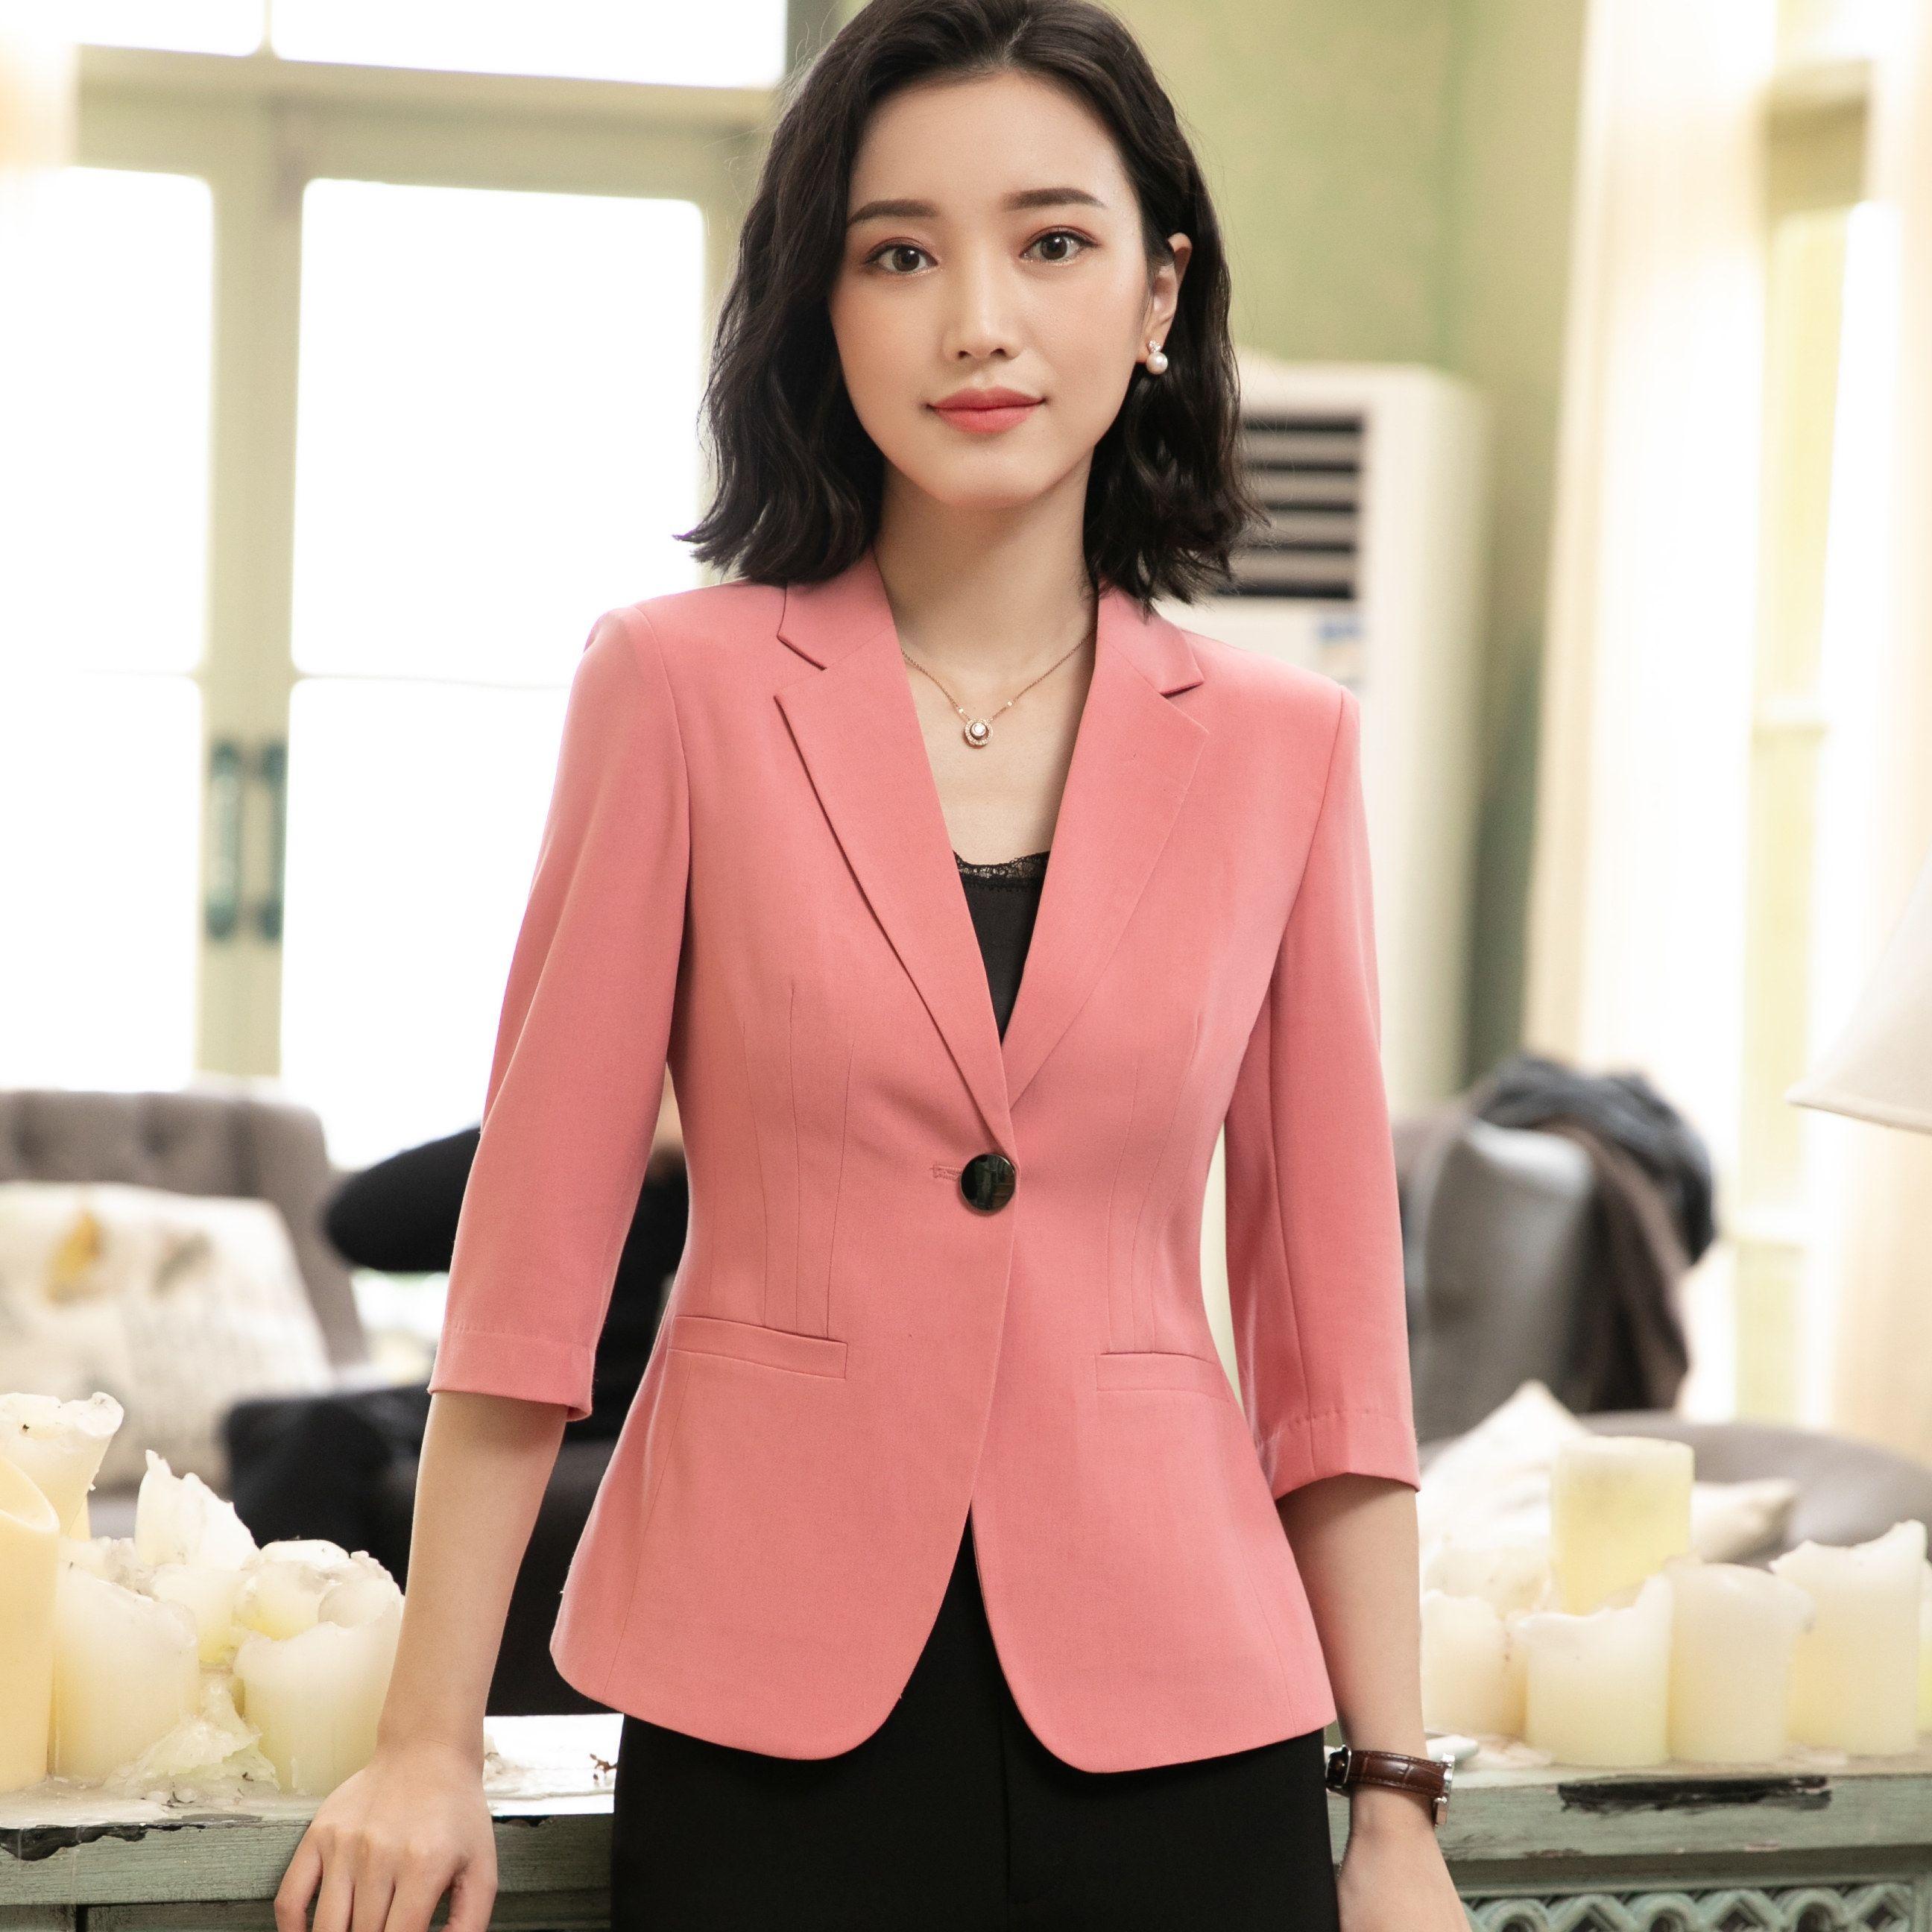 1d0b1168e0 Novelty Black Formal 2019 Spring Summer Fashion Business Half Sleeve Blazer  Jackets Women Office Work Wear Blazers Online with $23.85/Piece on  Dujotree's ...